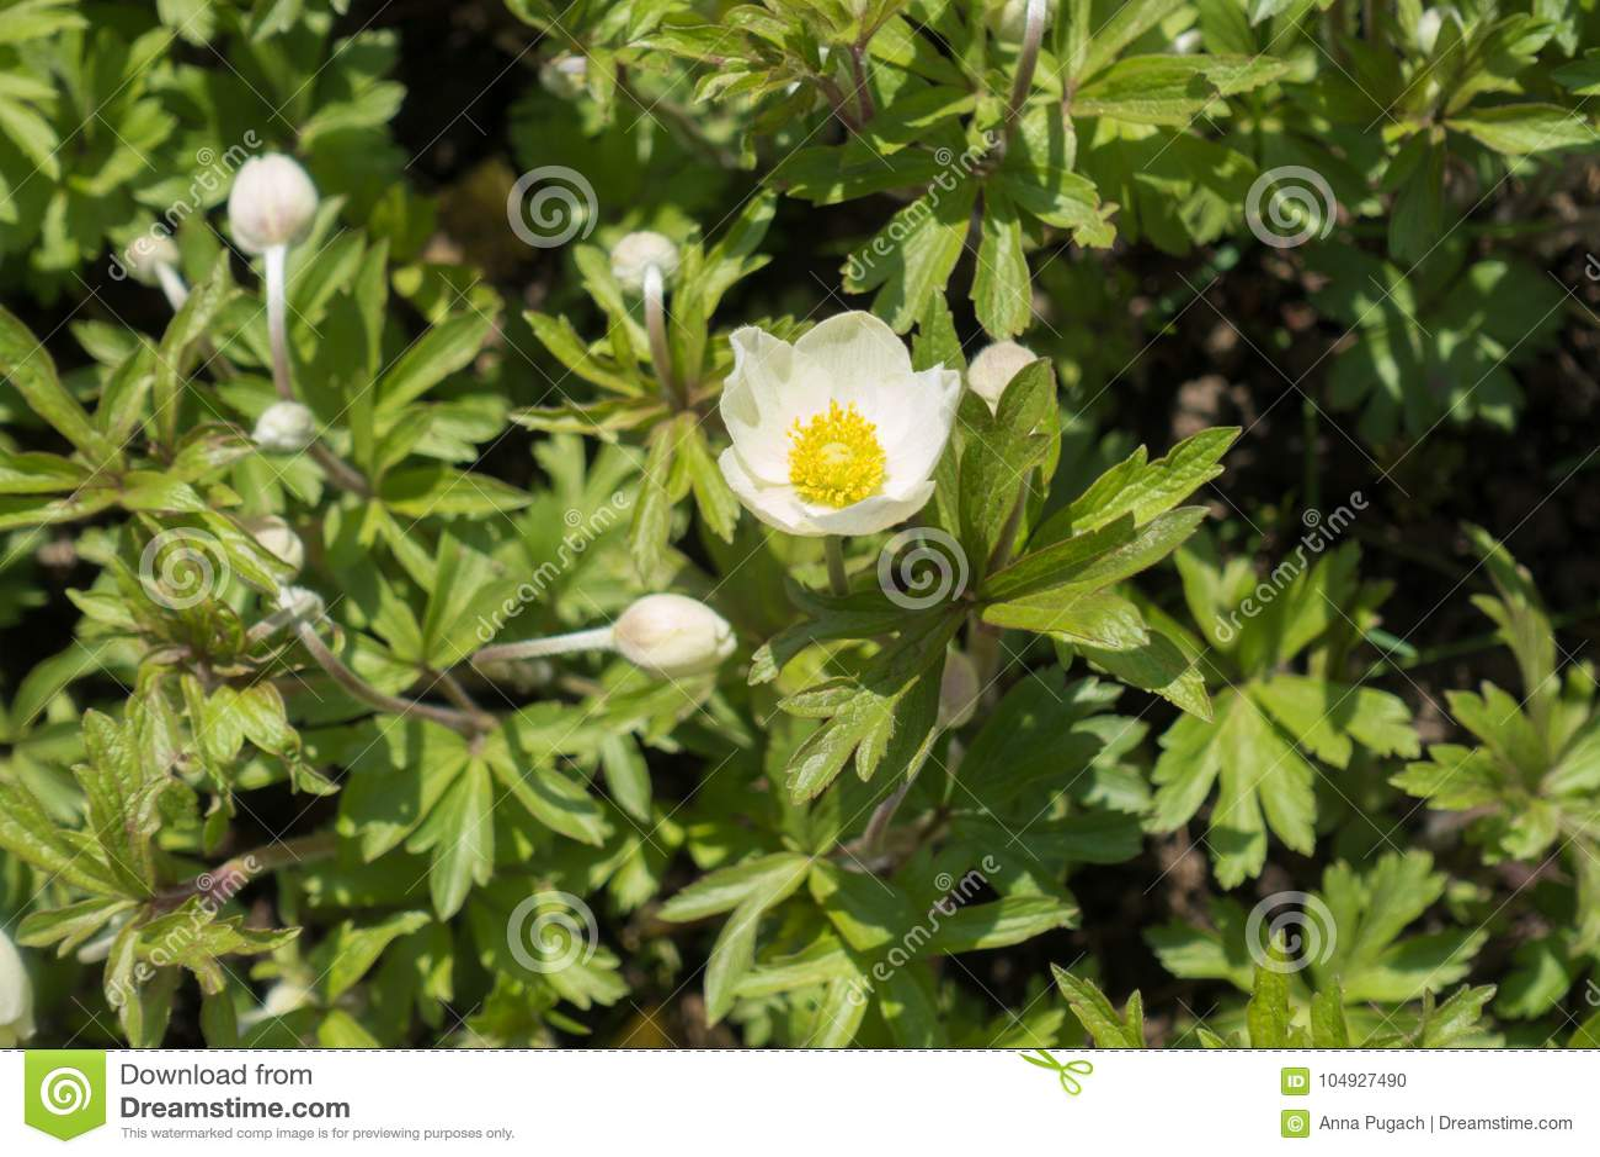 White colored flowers of snowdrop anemone stock photo image of white colored flowers of snowdrop anemone mightylinksfo